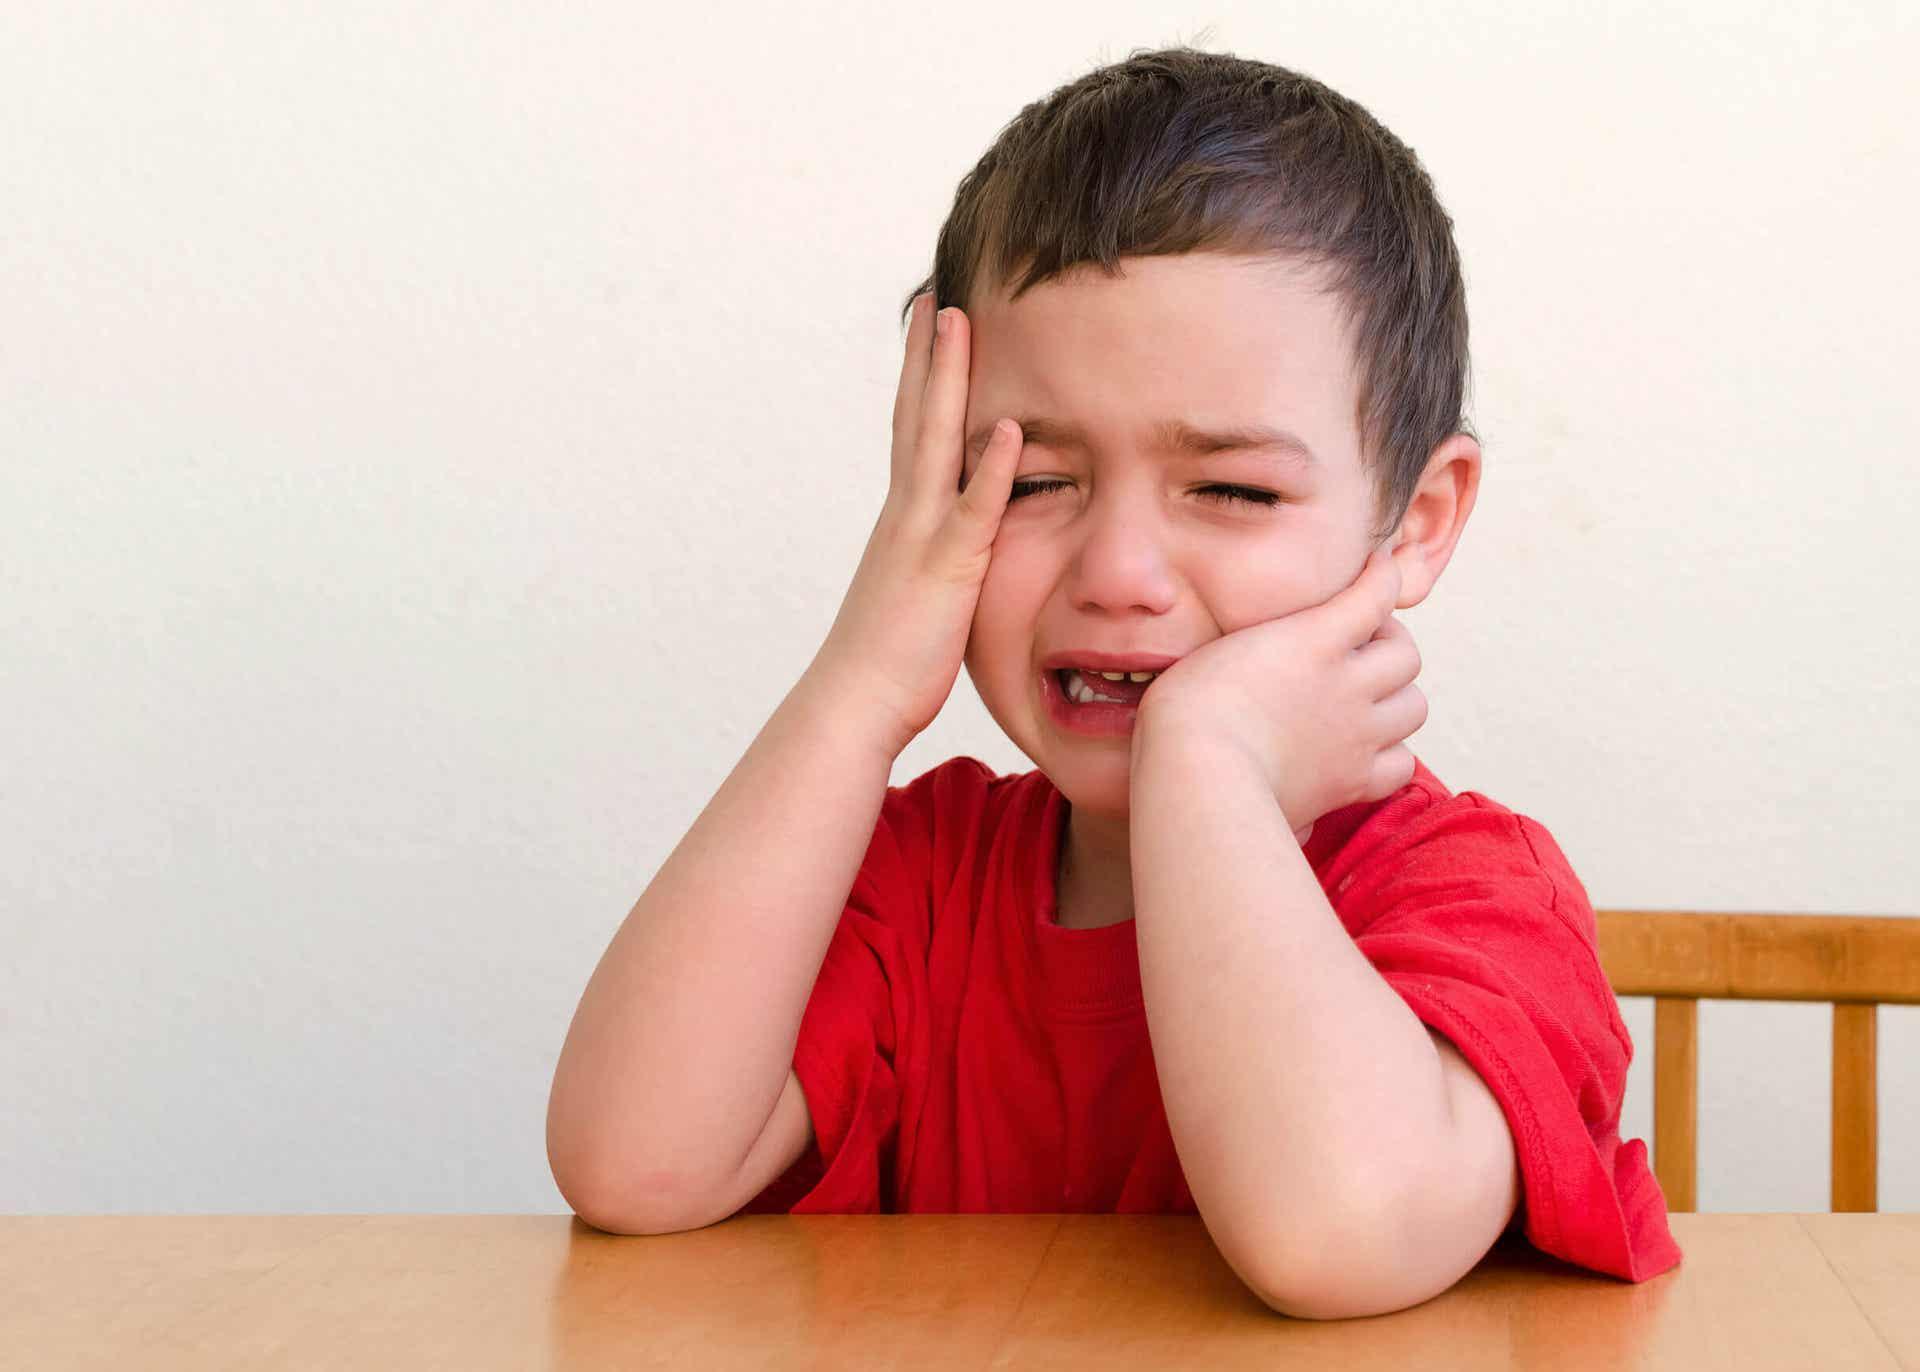 Bambino che cammina scalzo e piange.